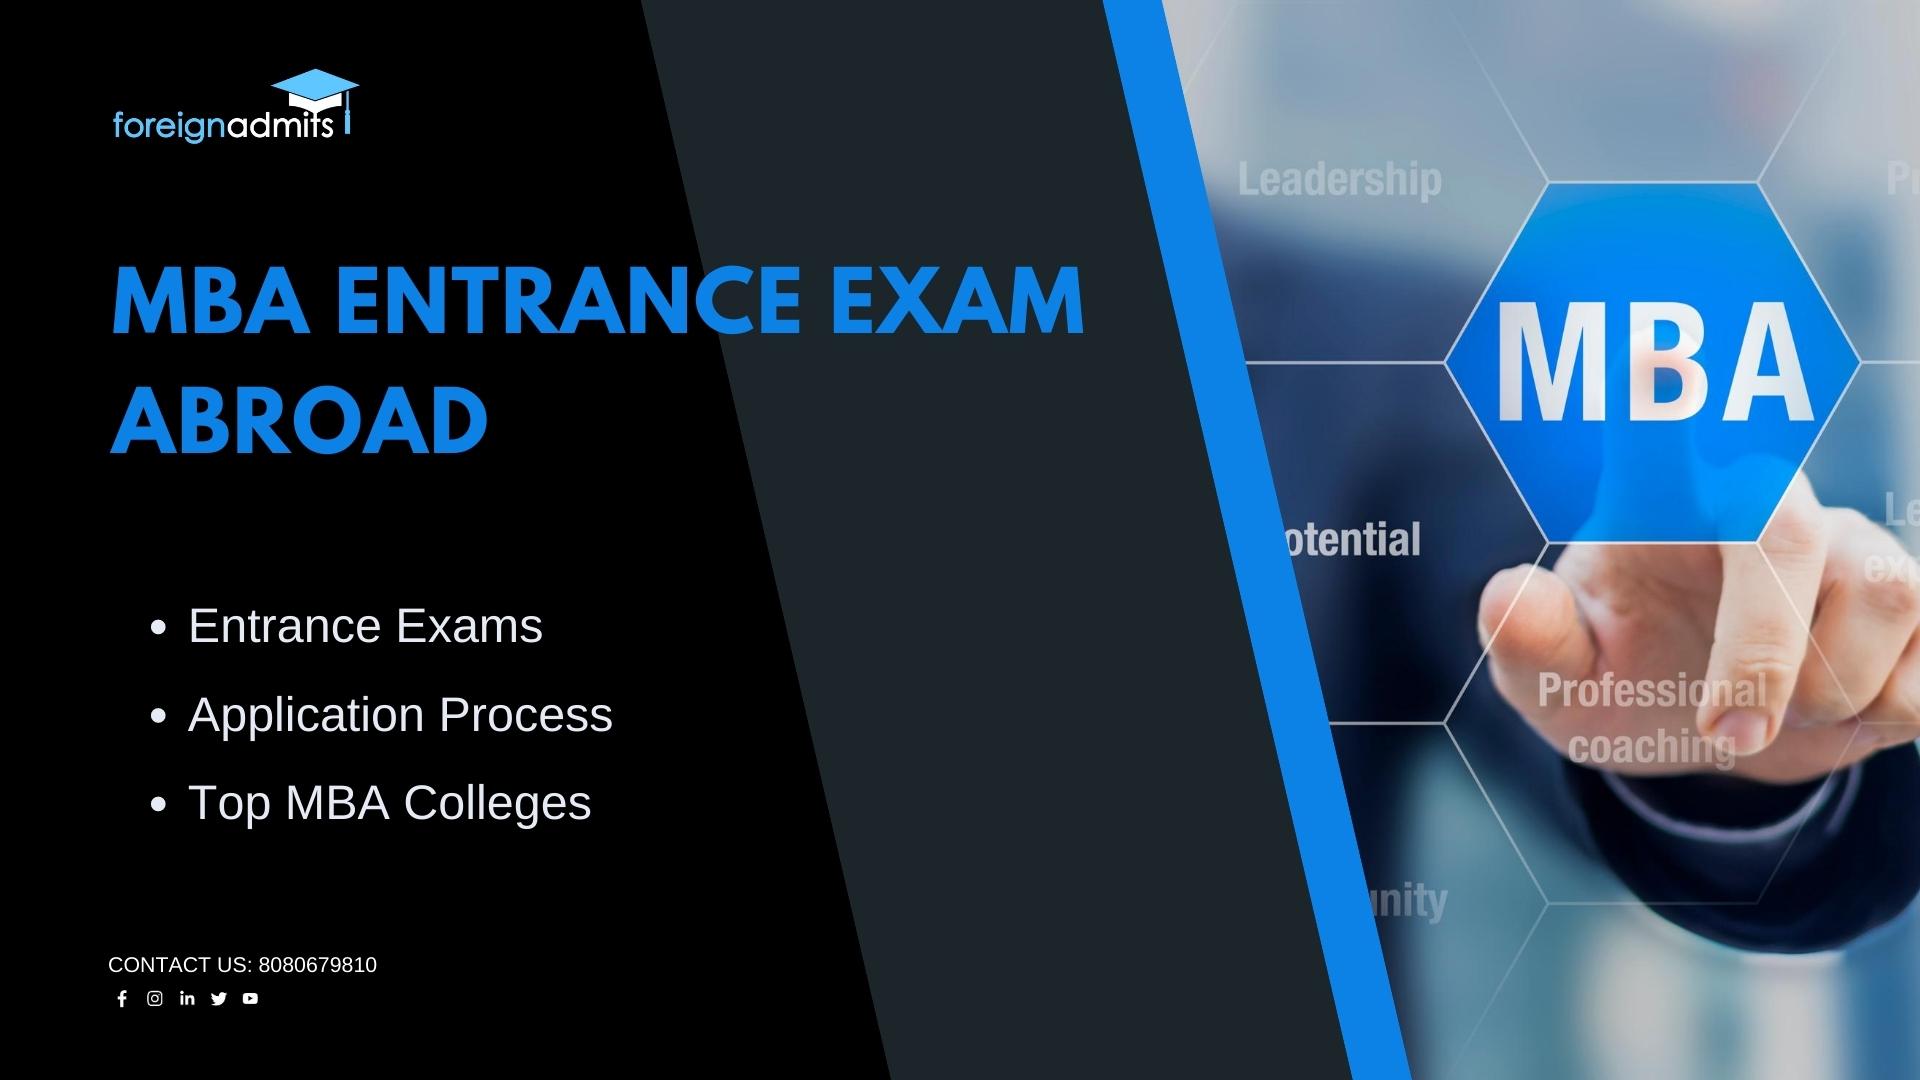 MBA Entrance Exam Abroad